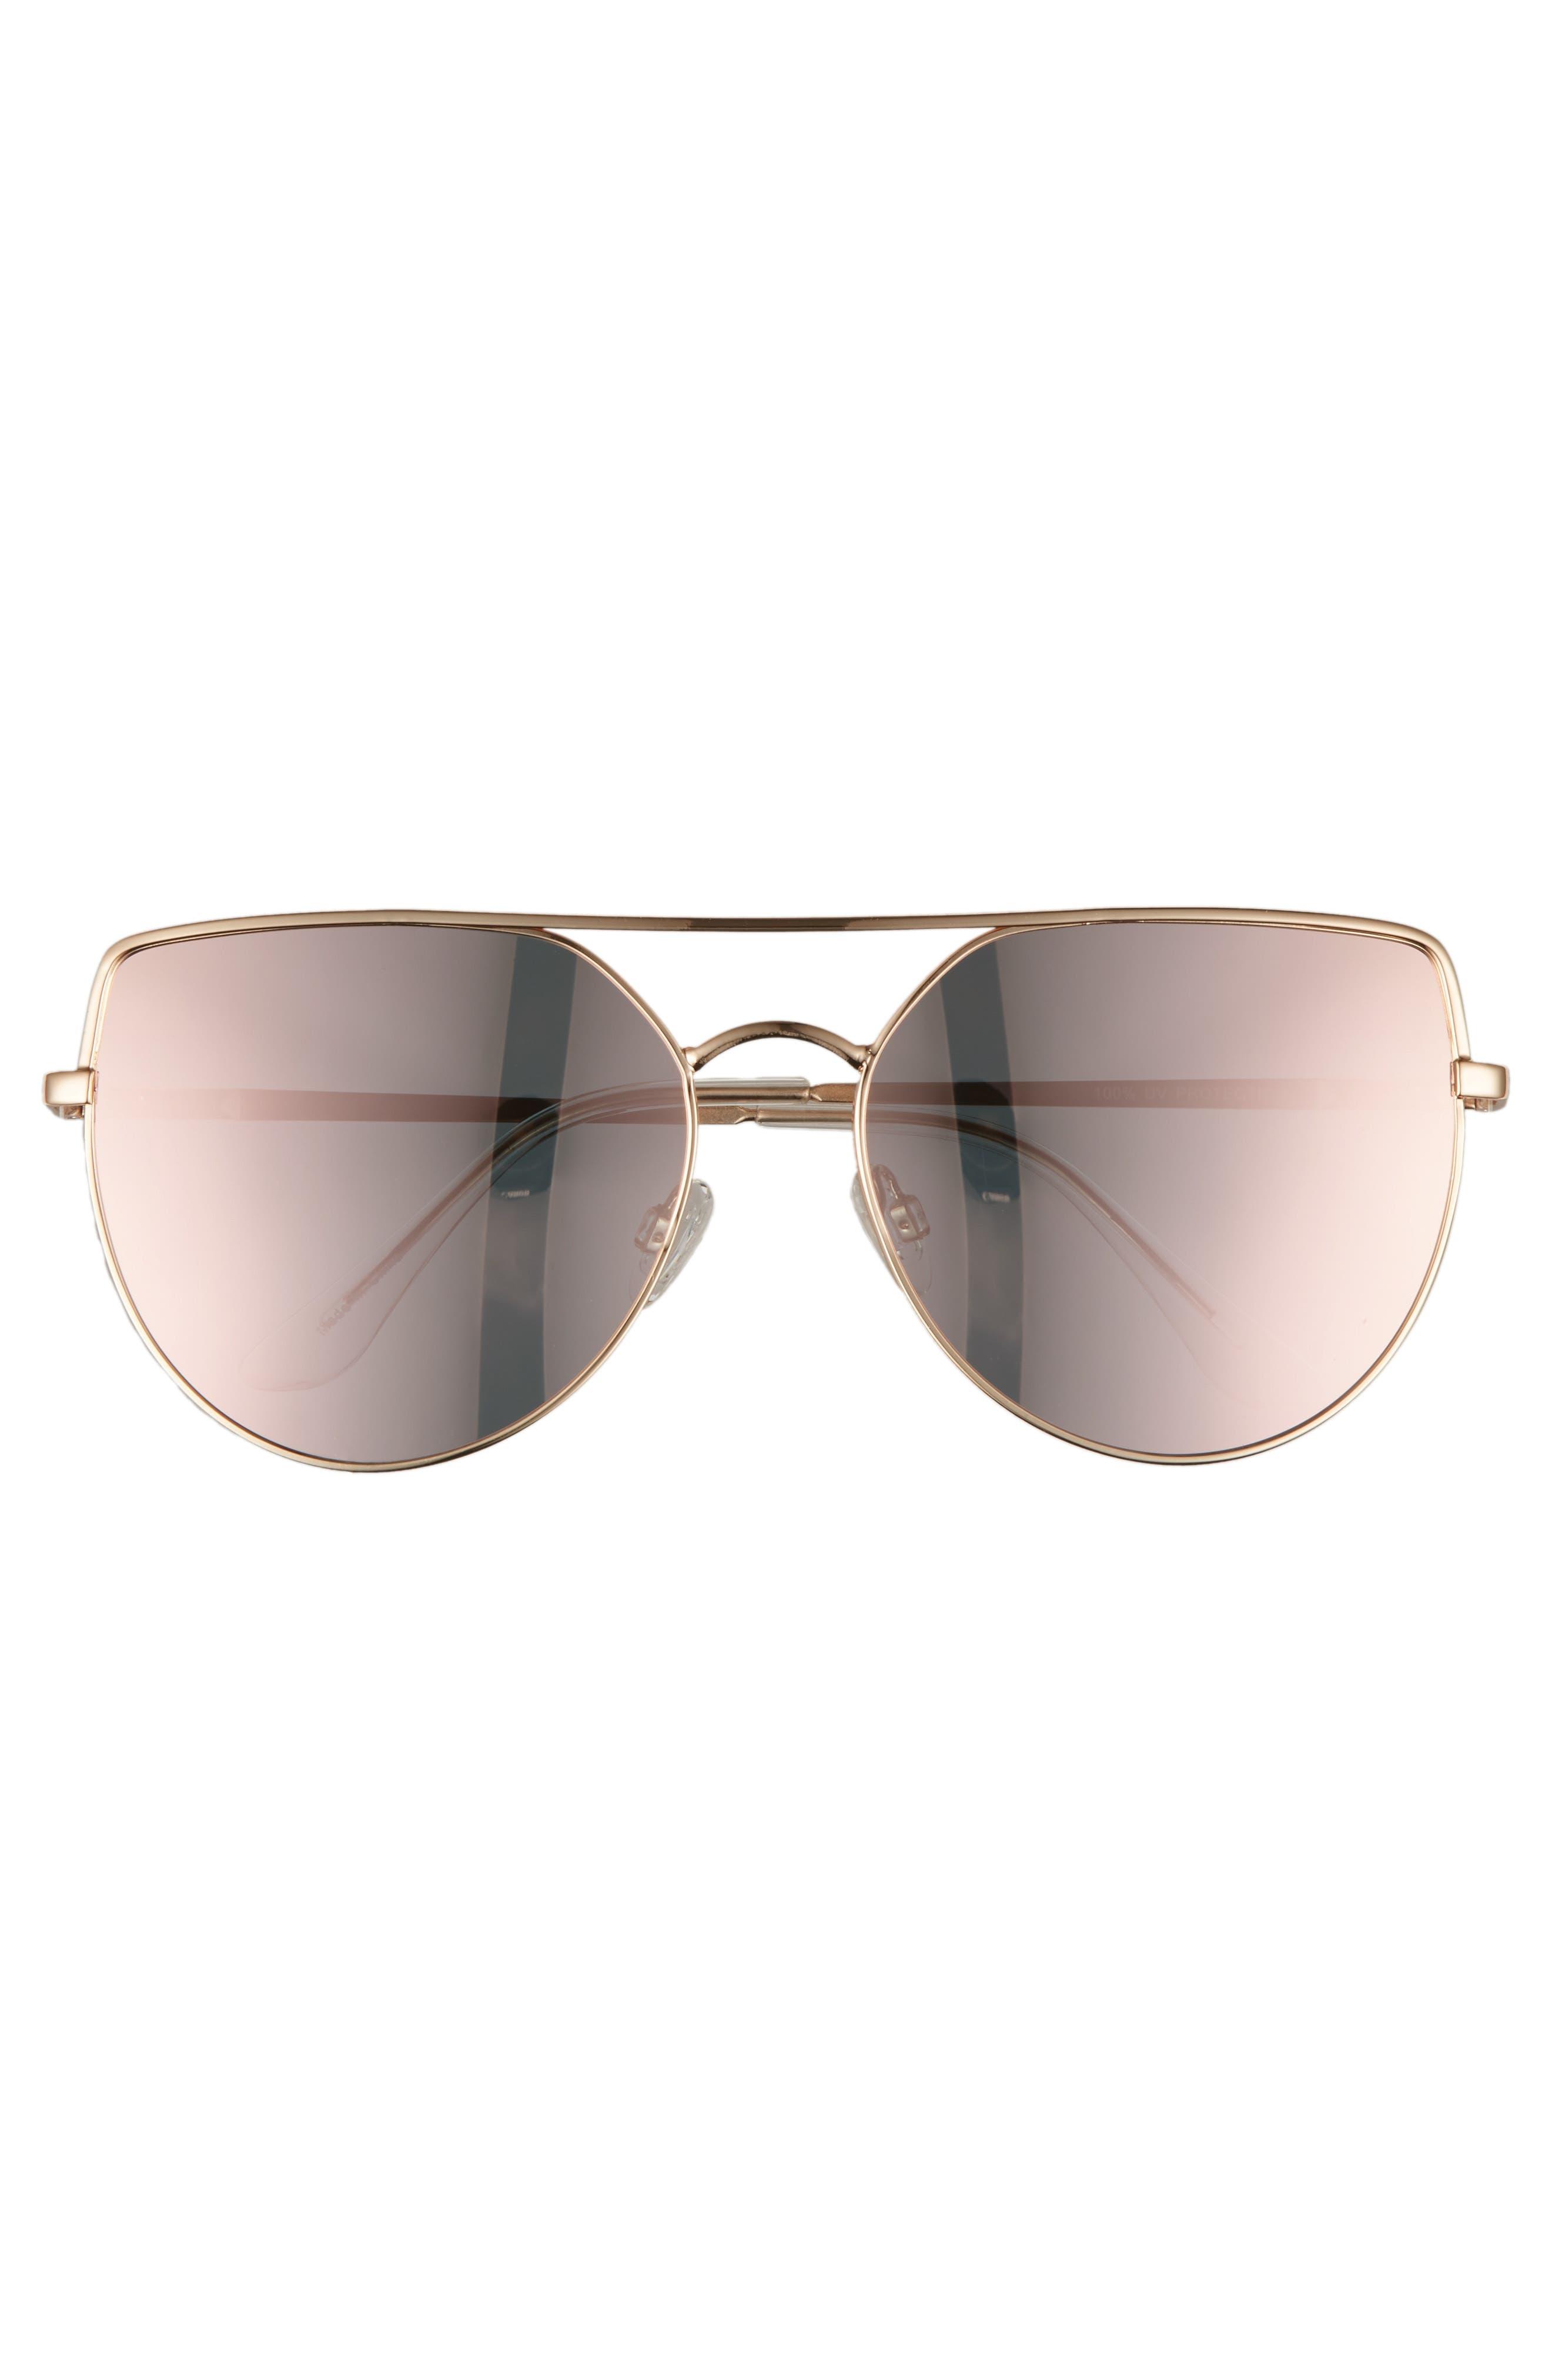 60mm Aviator Sunglasses,                             Alternate thumbnail 3, color,                             220